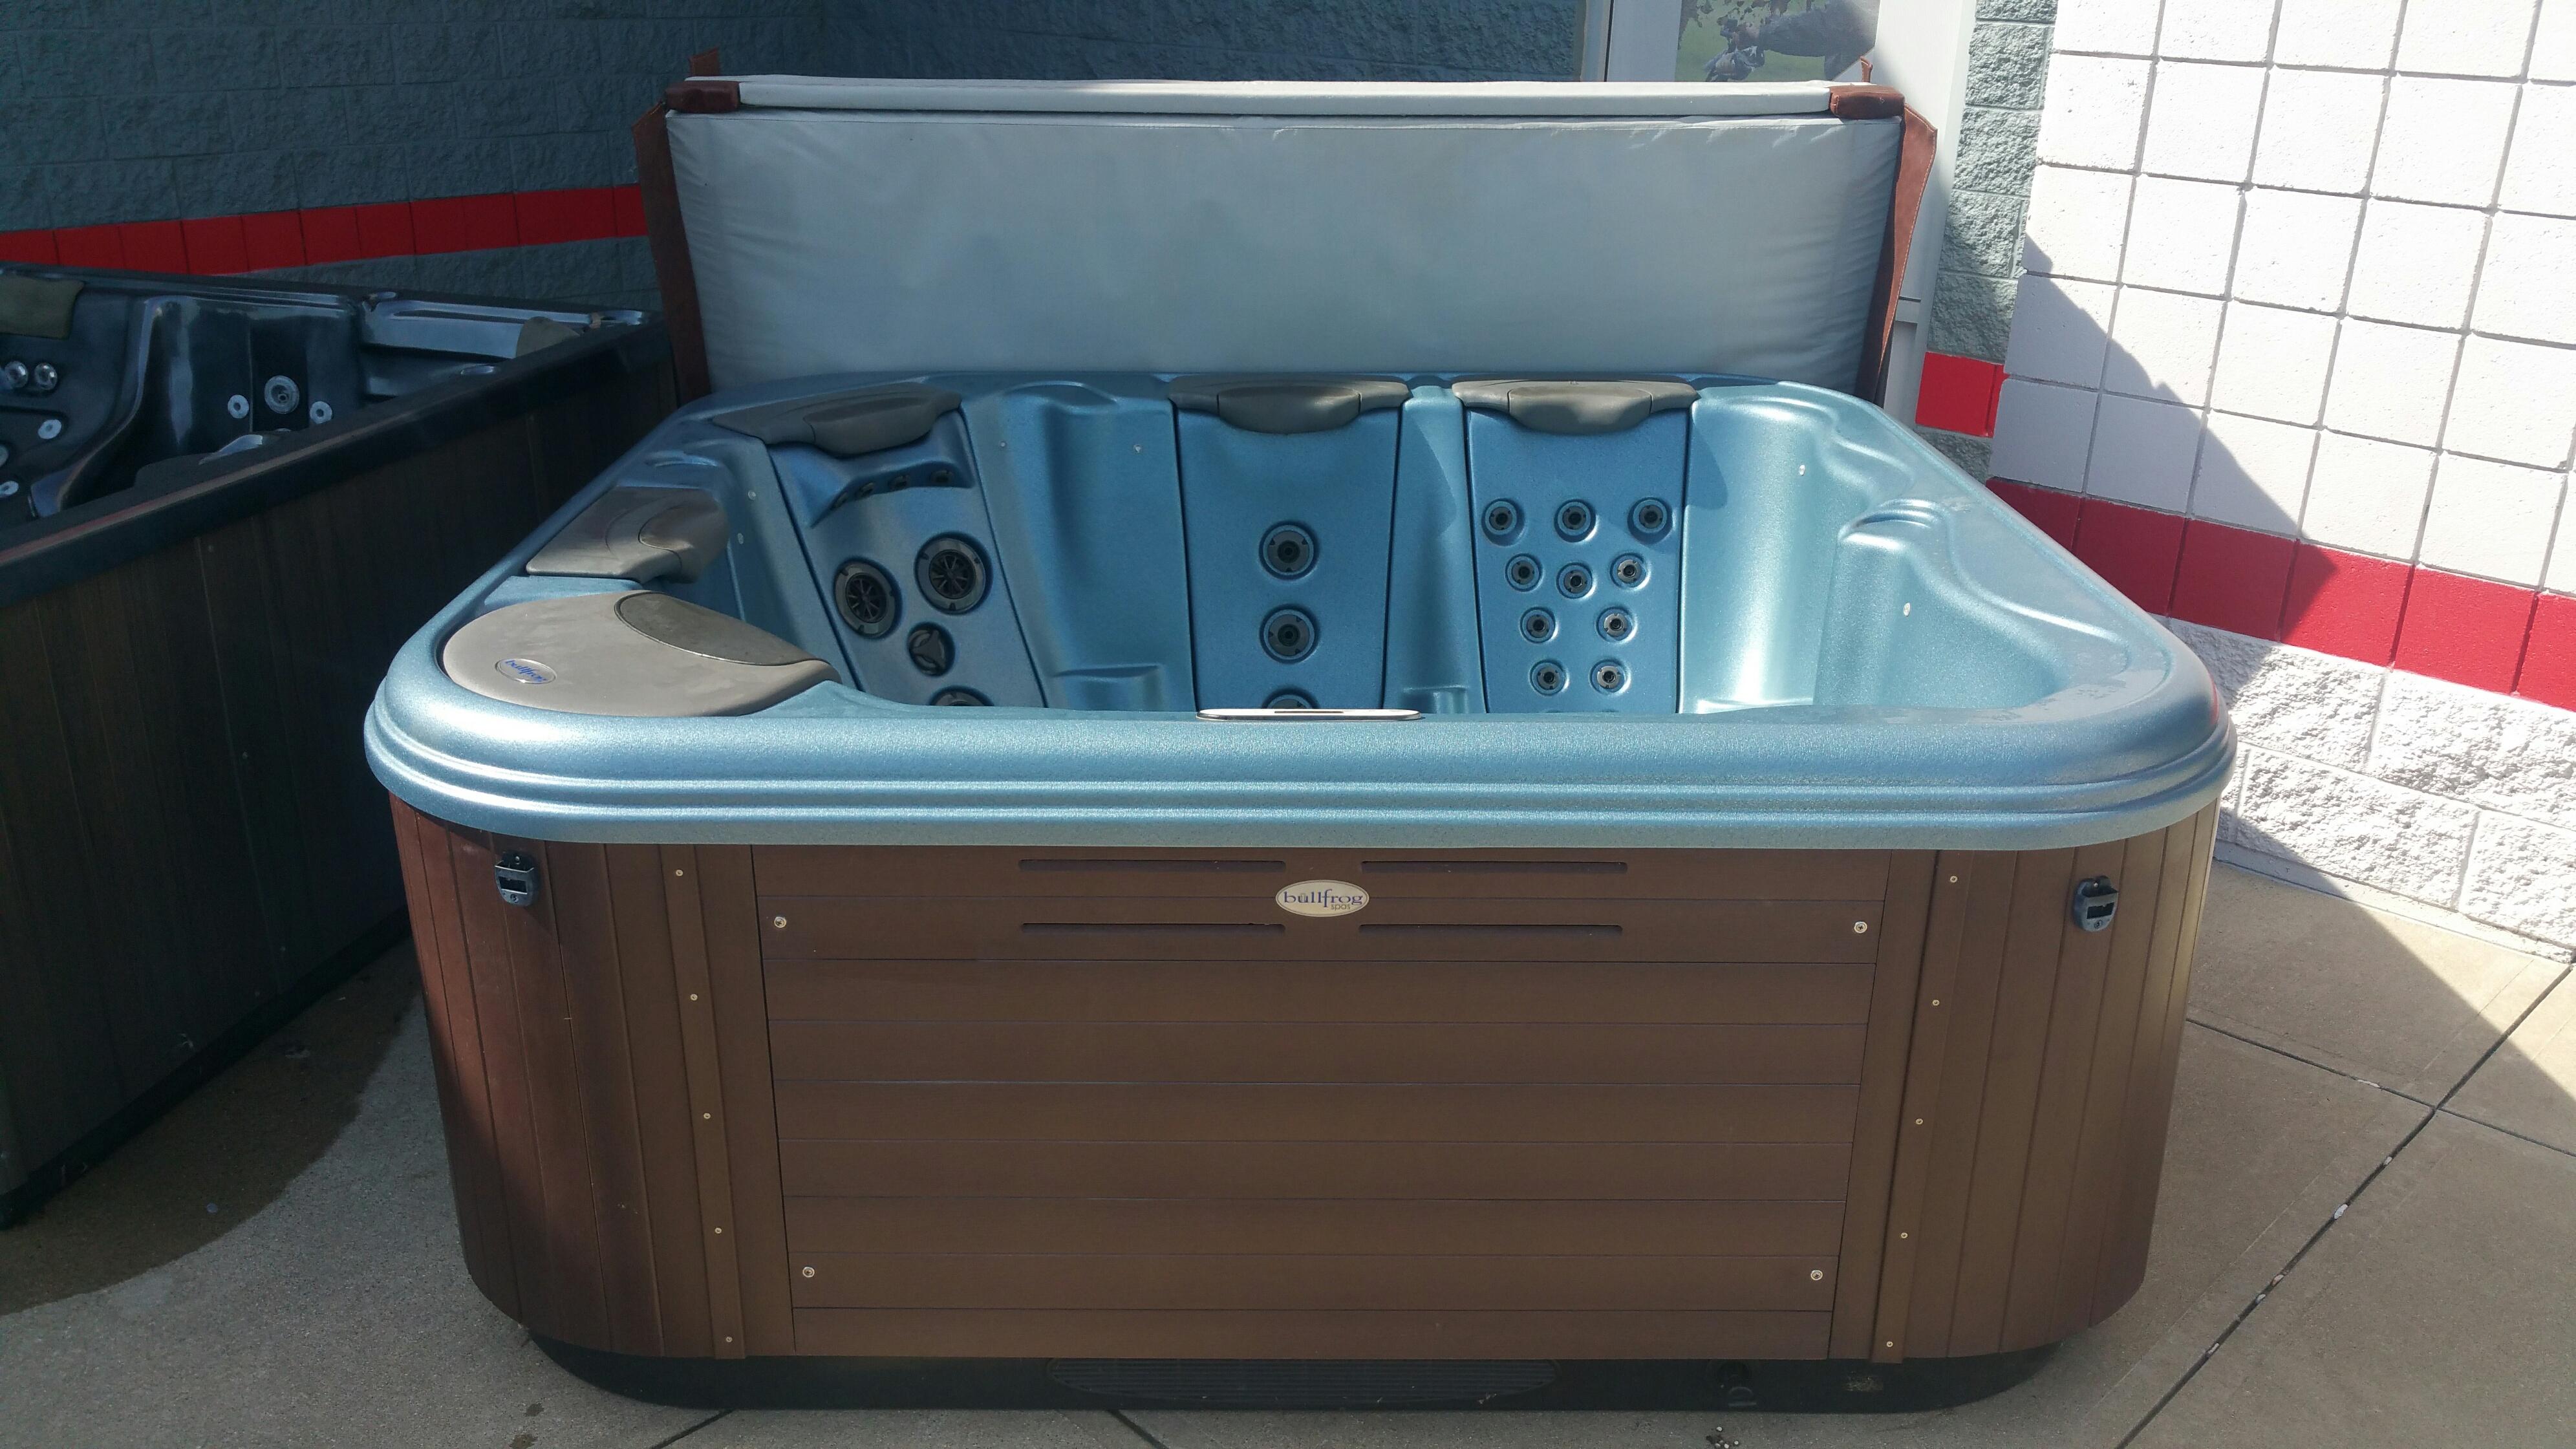 Used Hot Tubs - Backyard Leisure